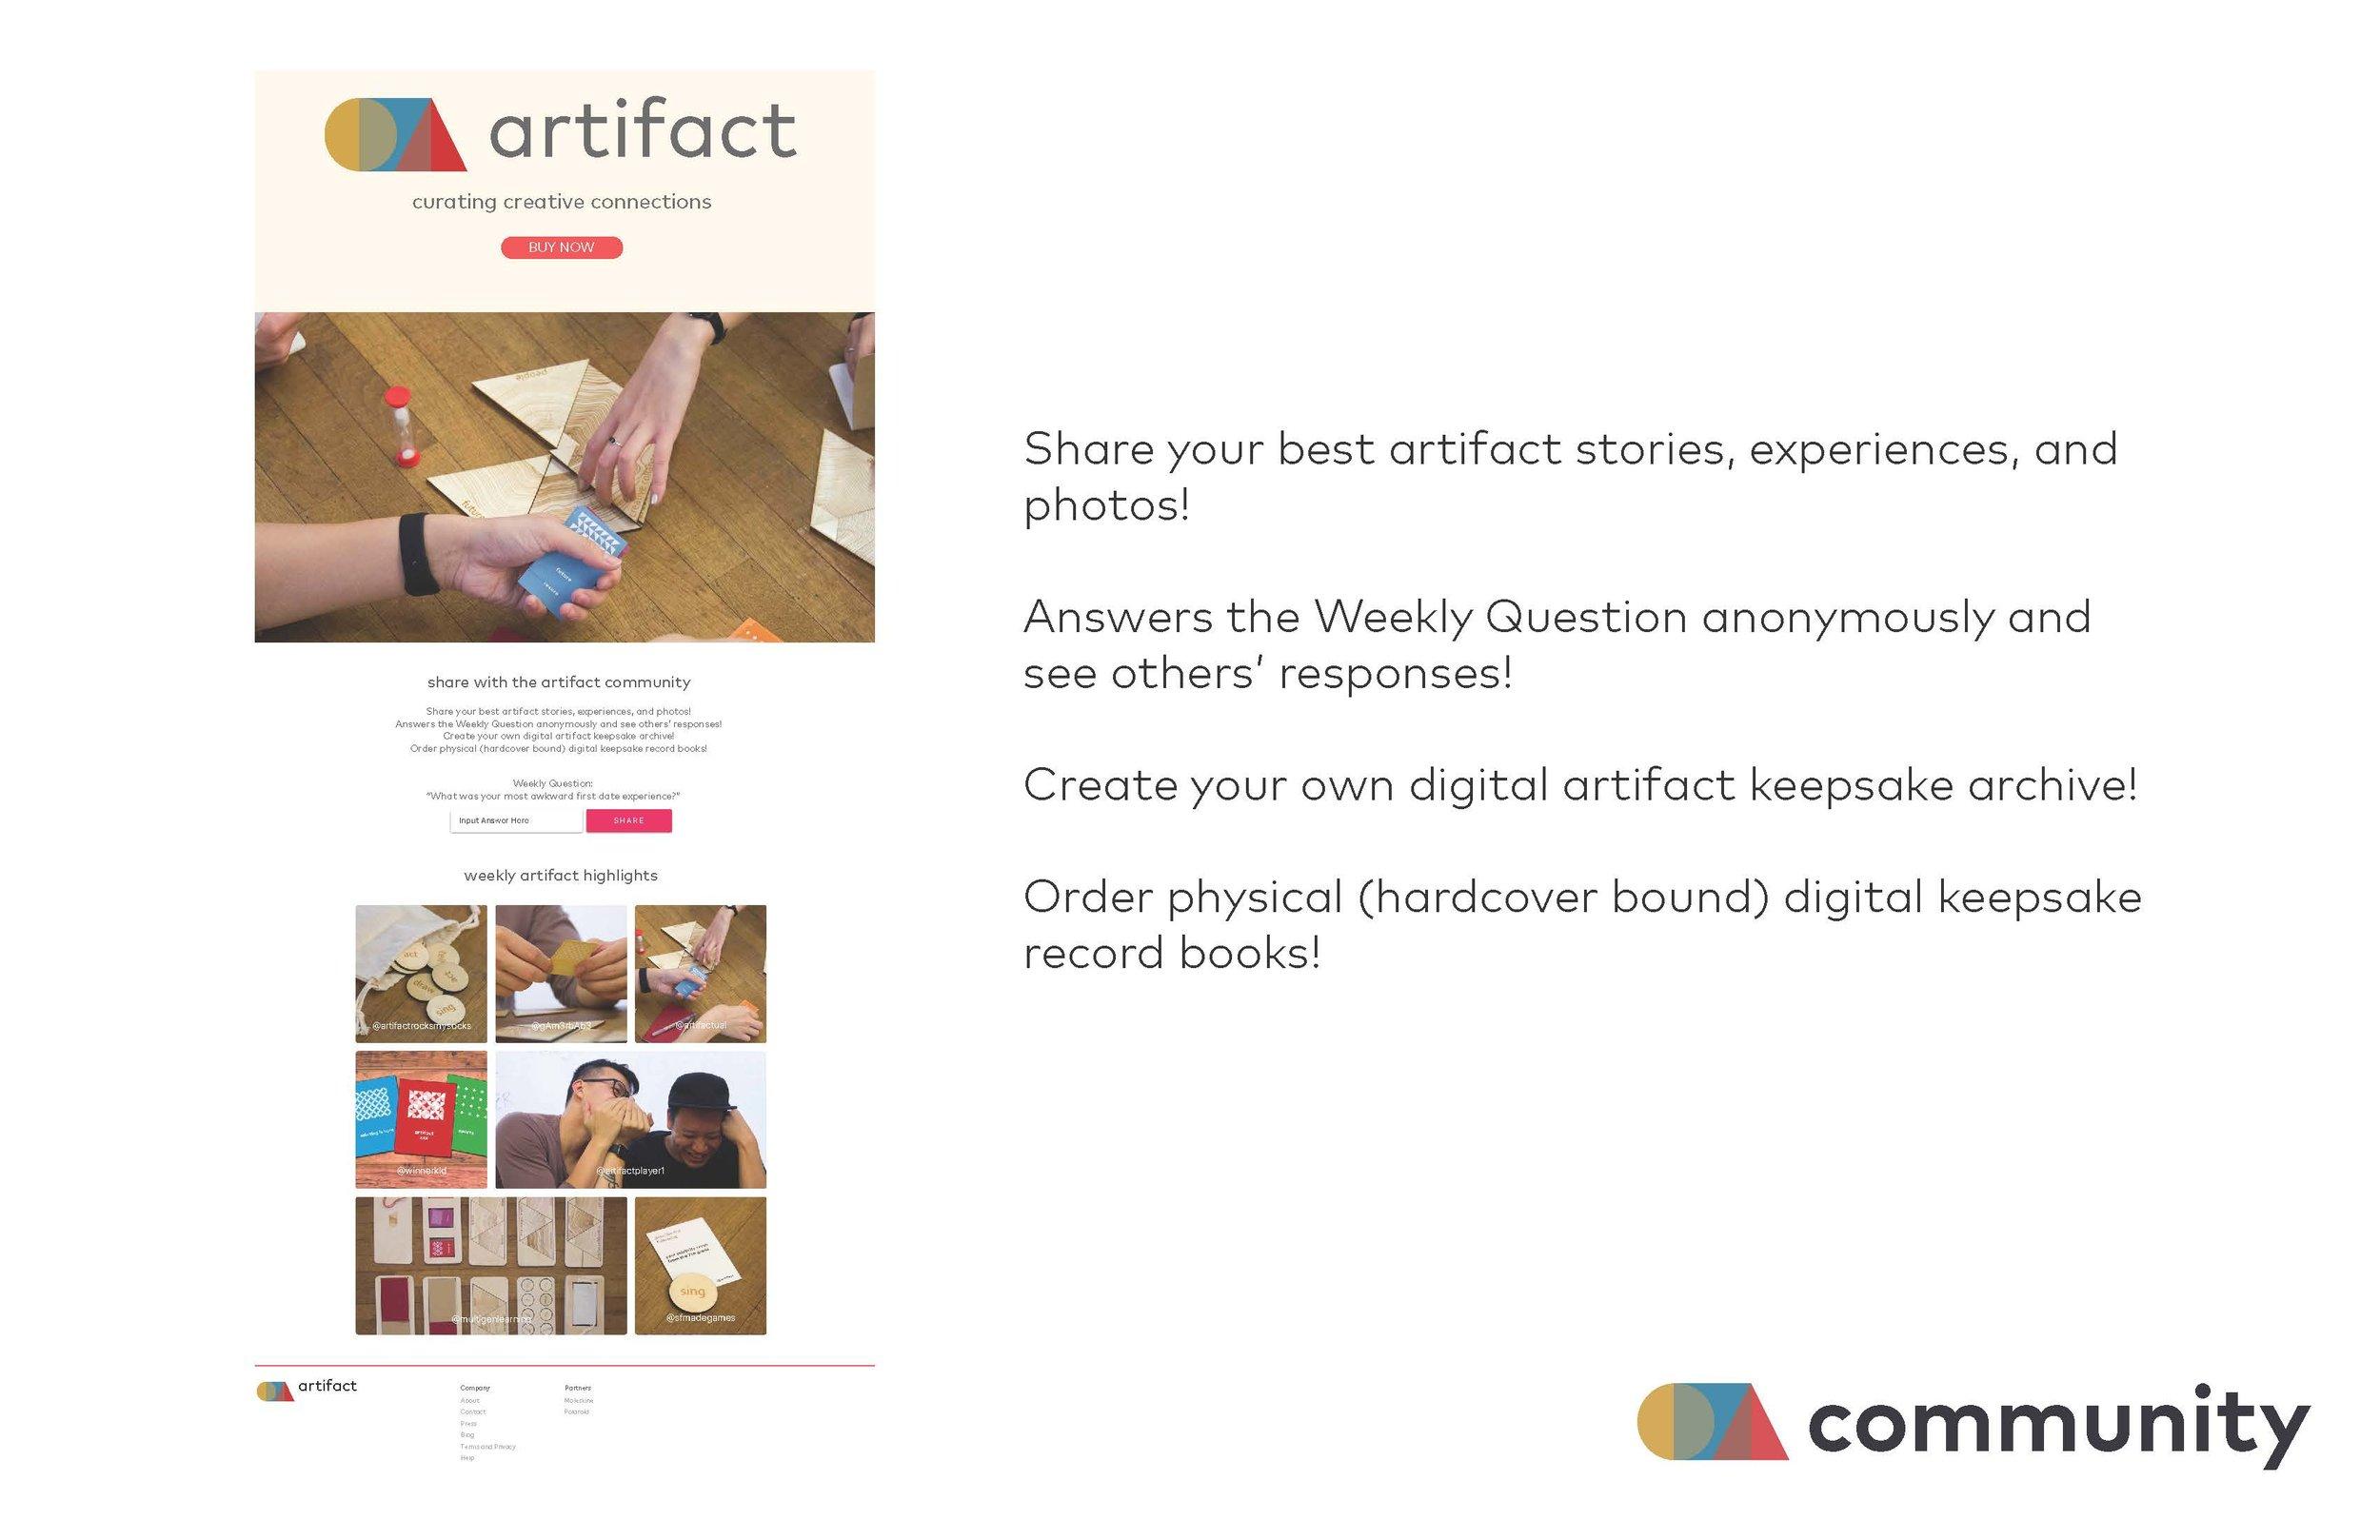 ArtifactFinalPresentation-1_Page_30.jpg